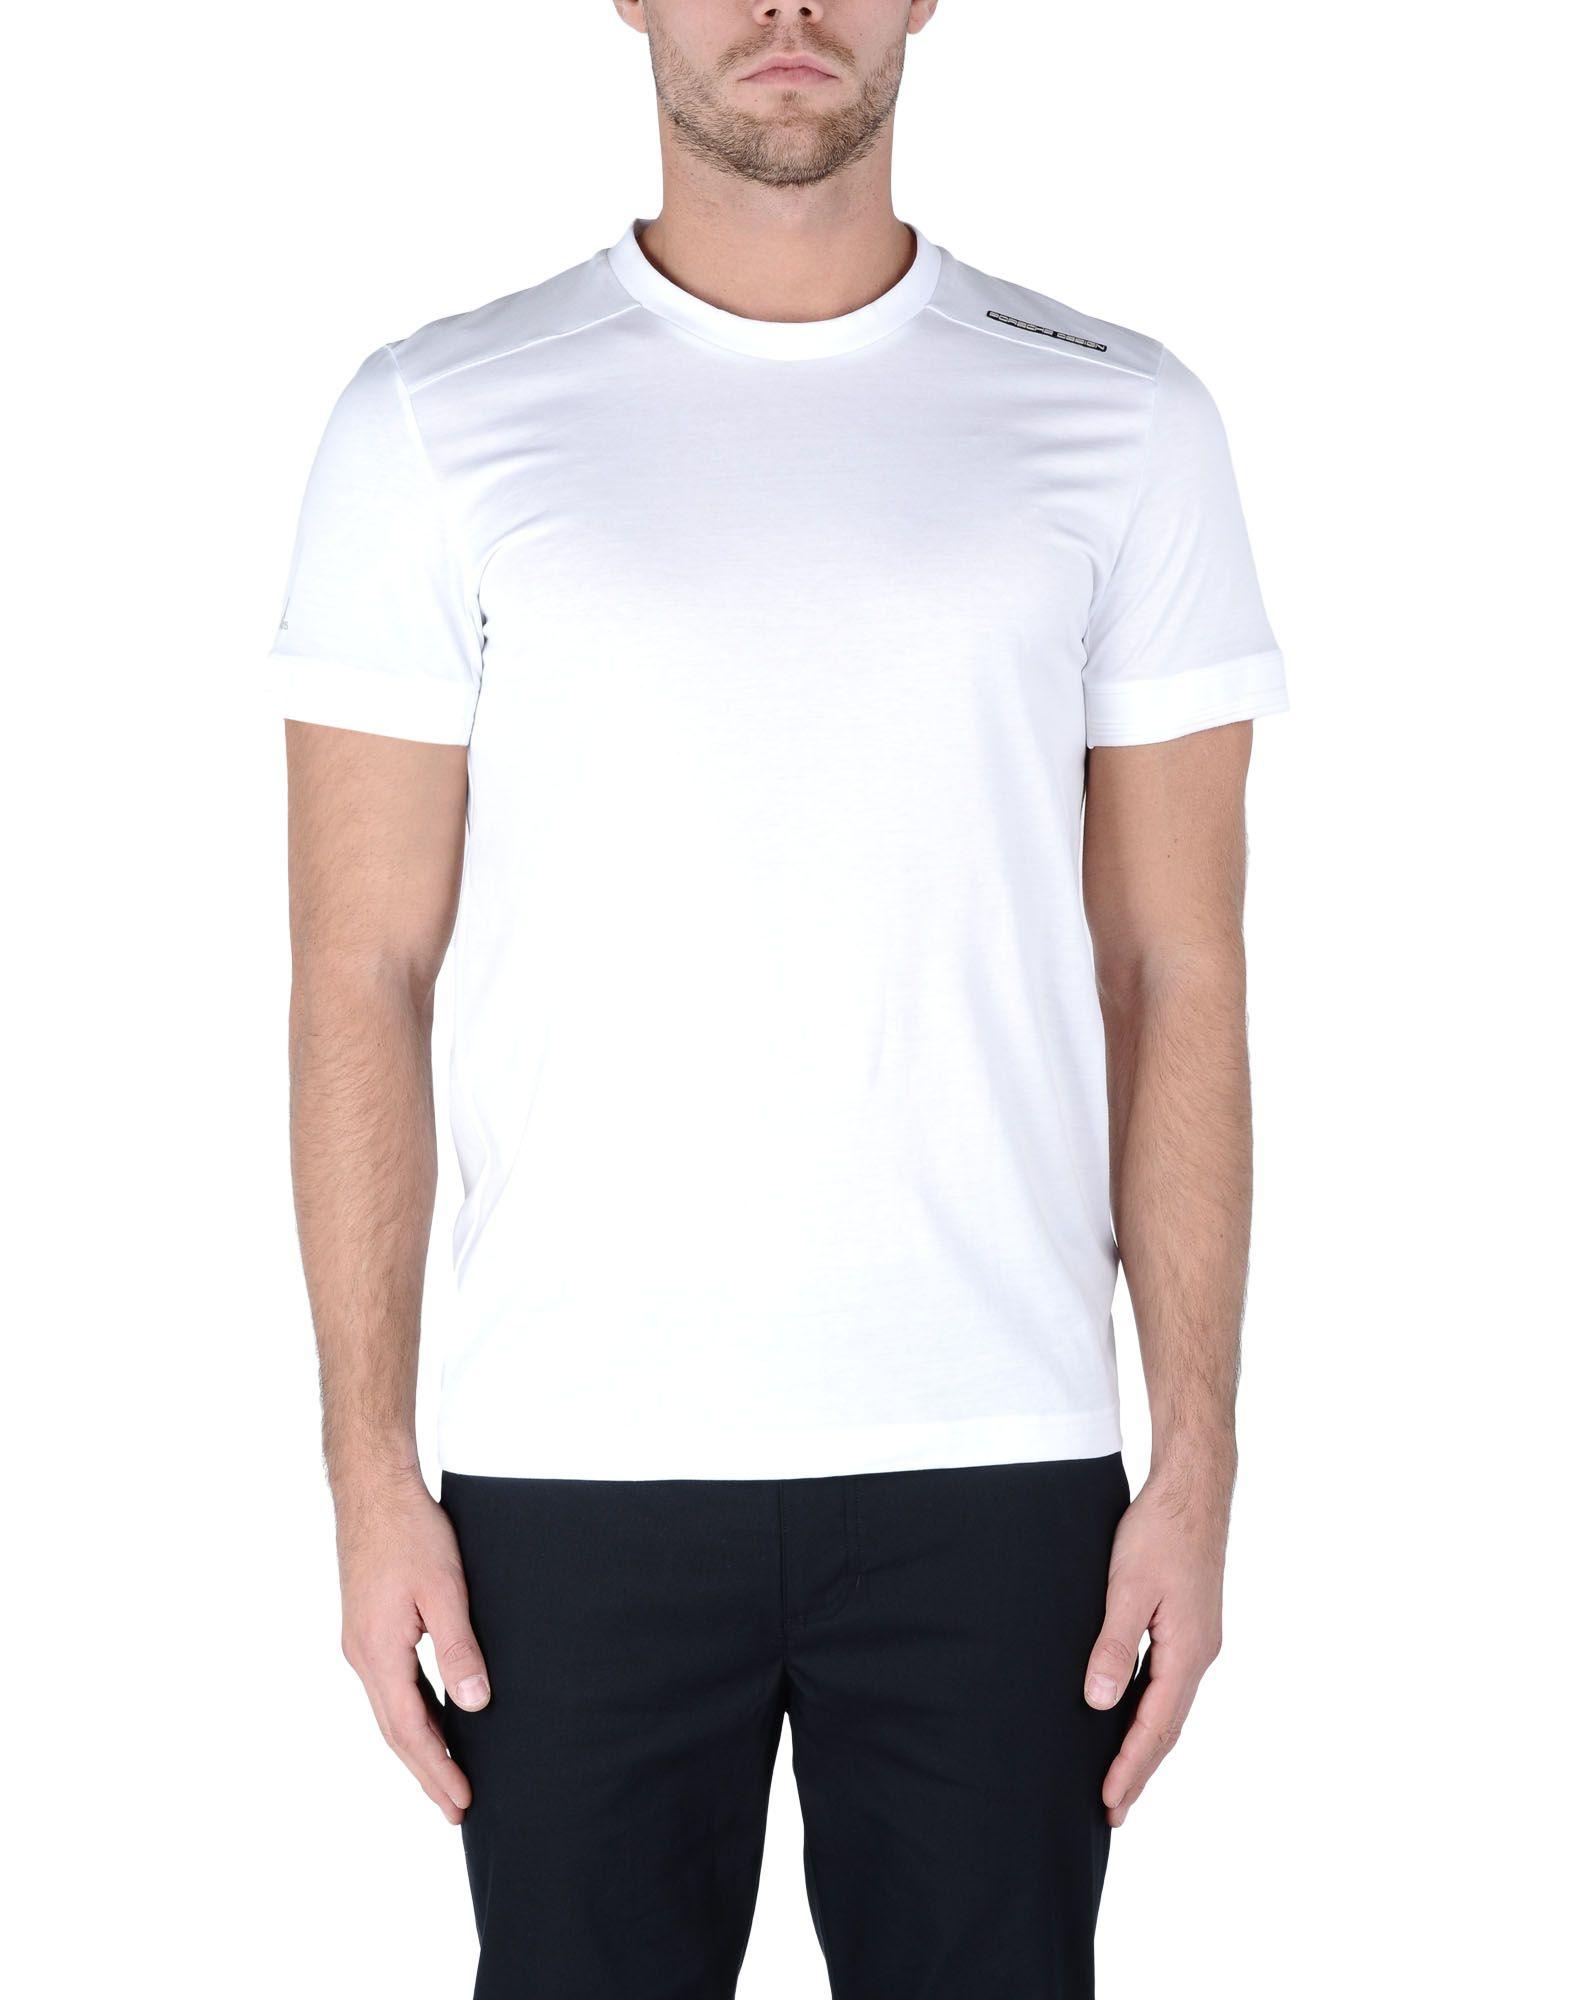 White t shirt for design - Gallery